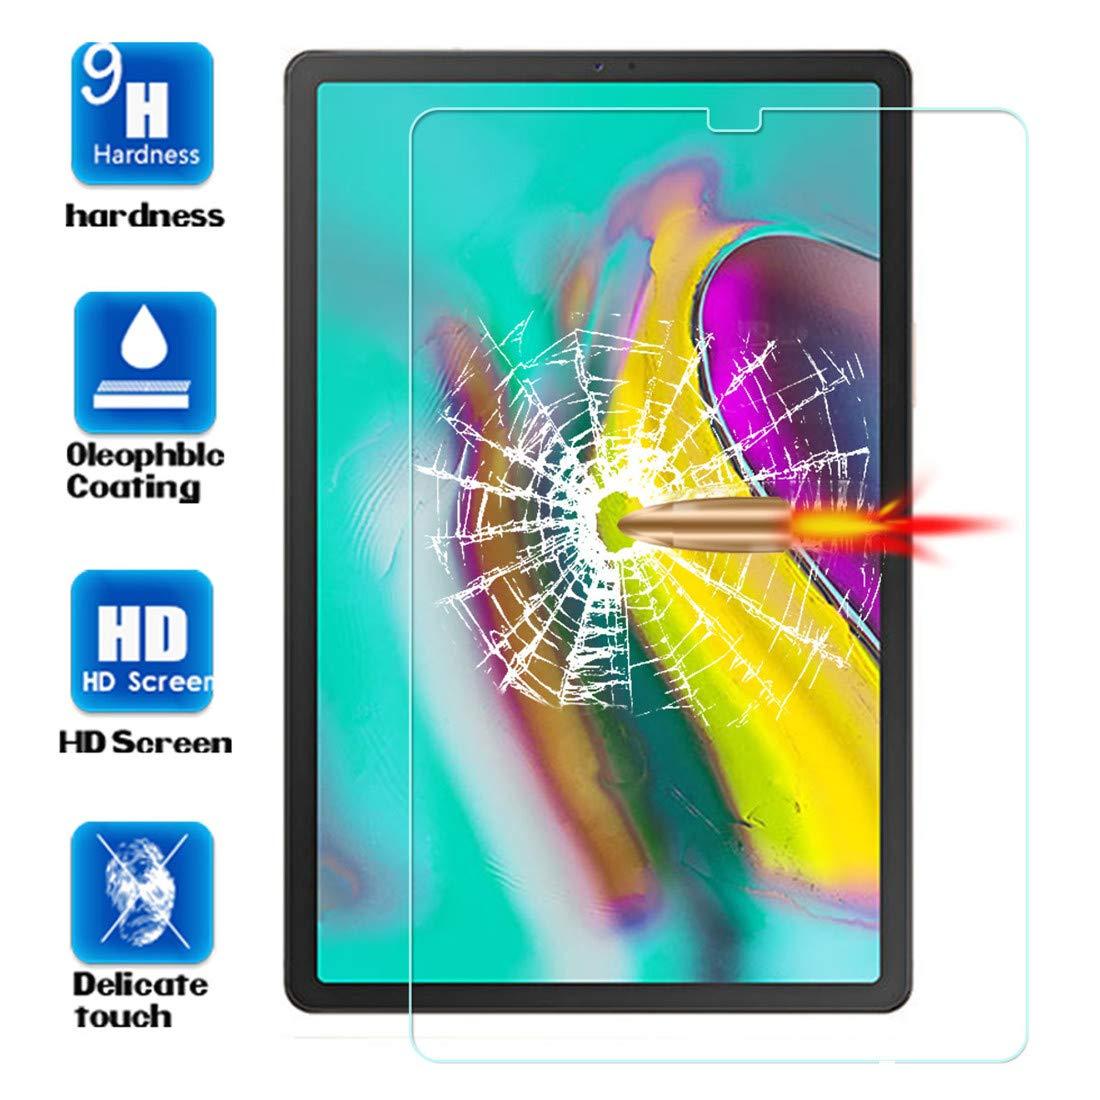 Tempered Glass For Samsung Galaxy Tab S5e 10.5 2019 Screen Protection Glass Cover For Samsung Galaxy Tab S5e SM-T720 T725 10.5